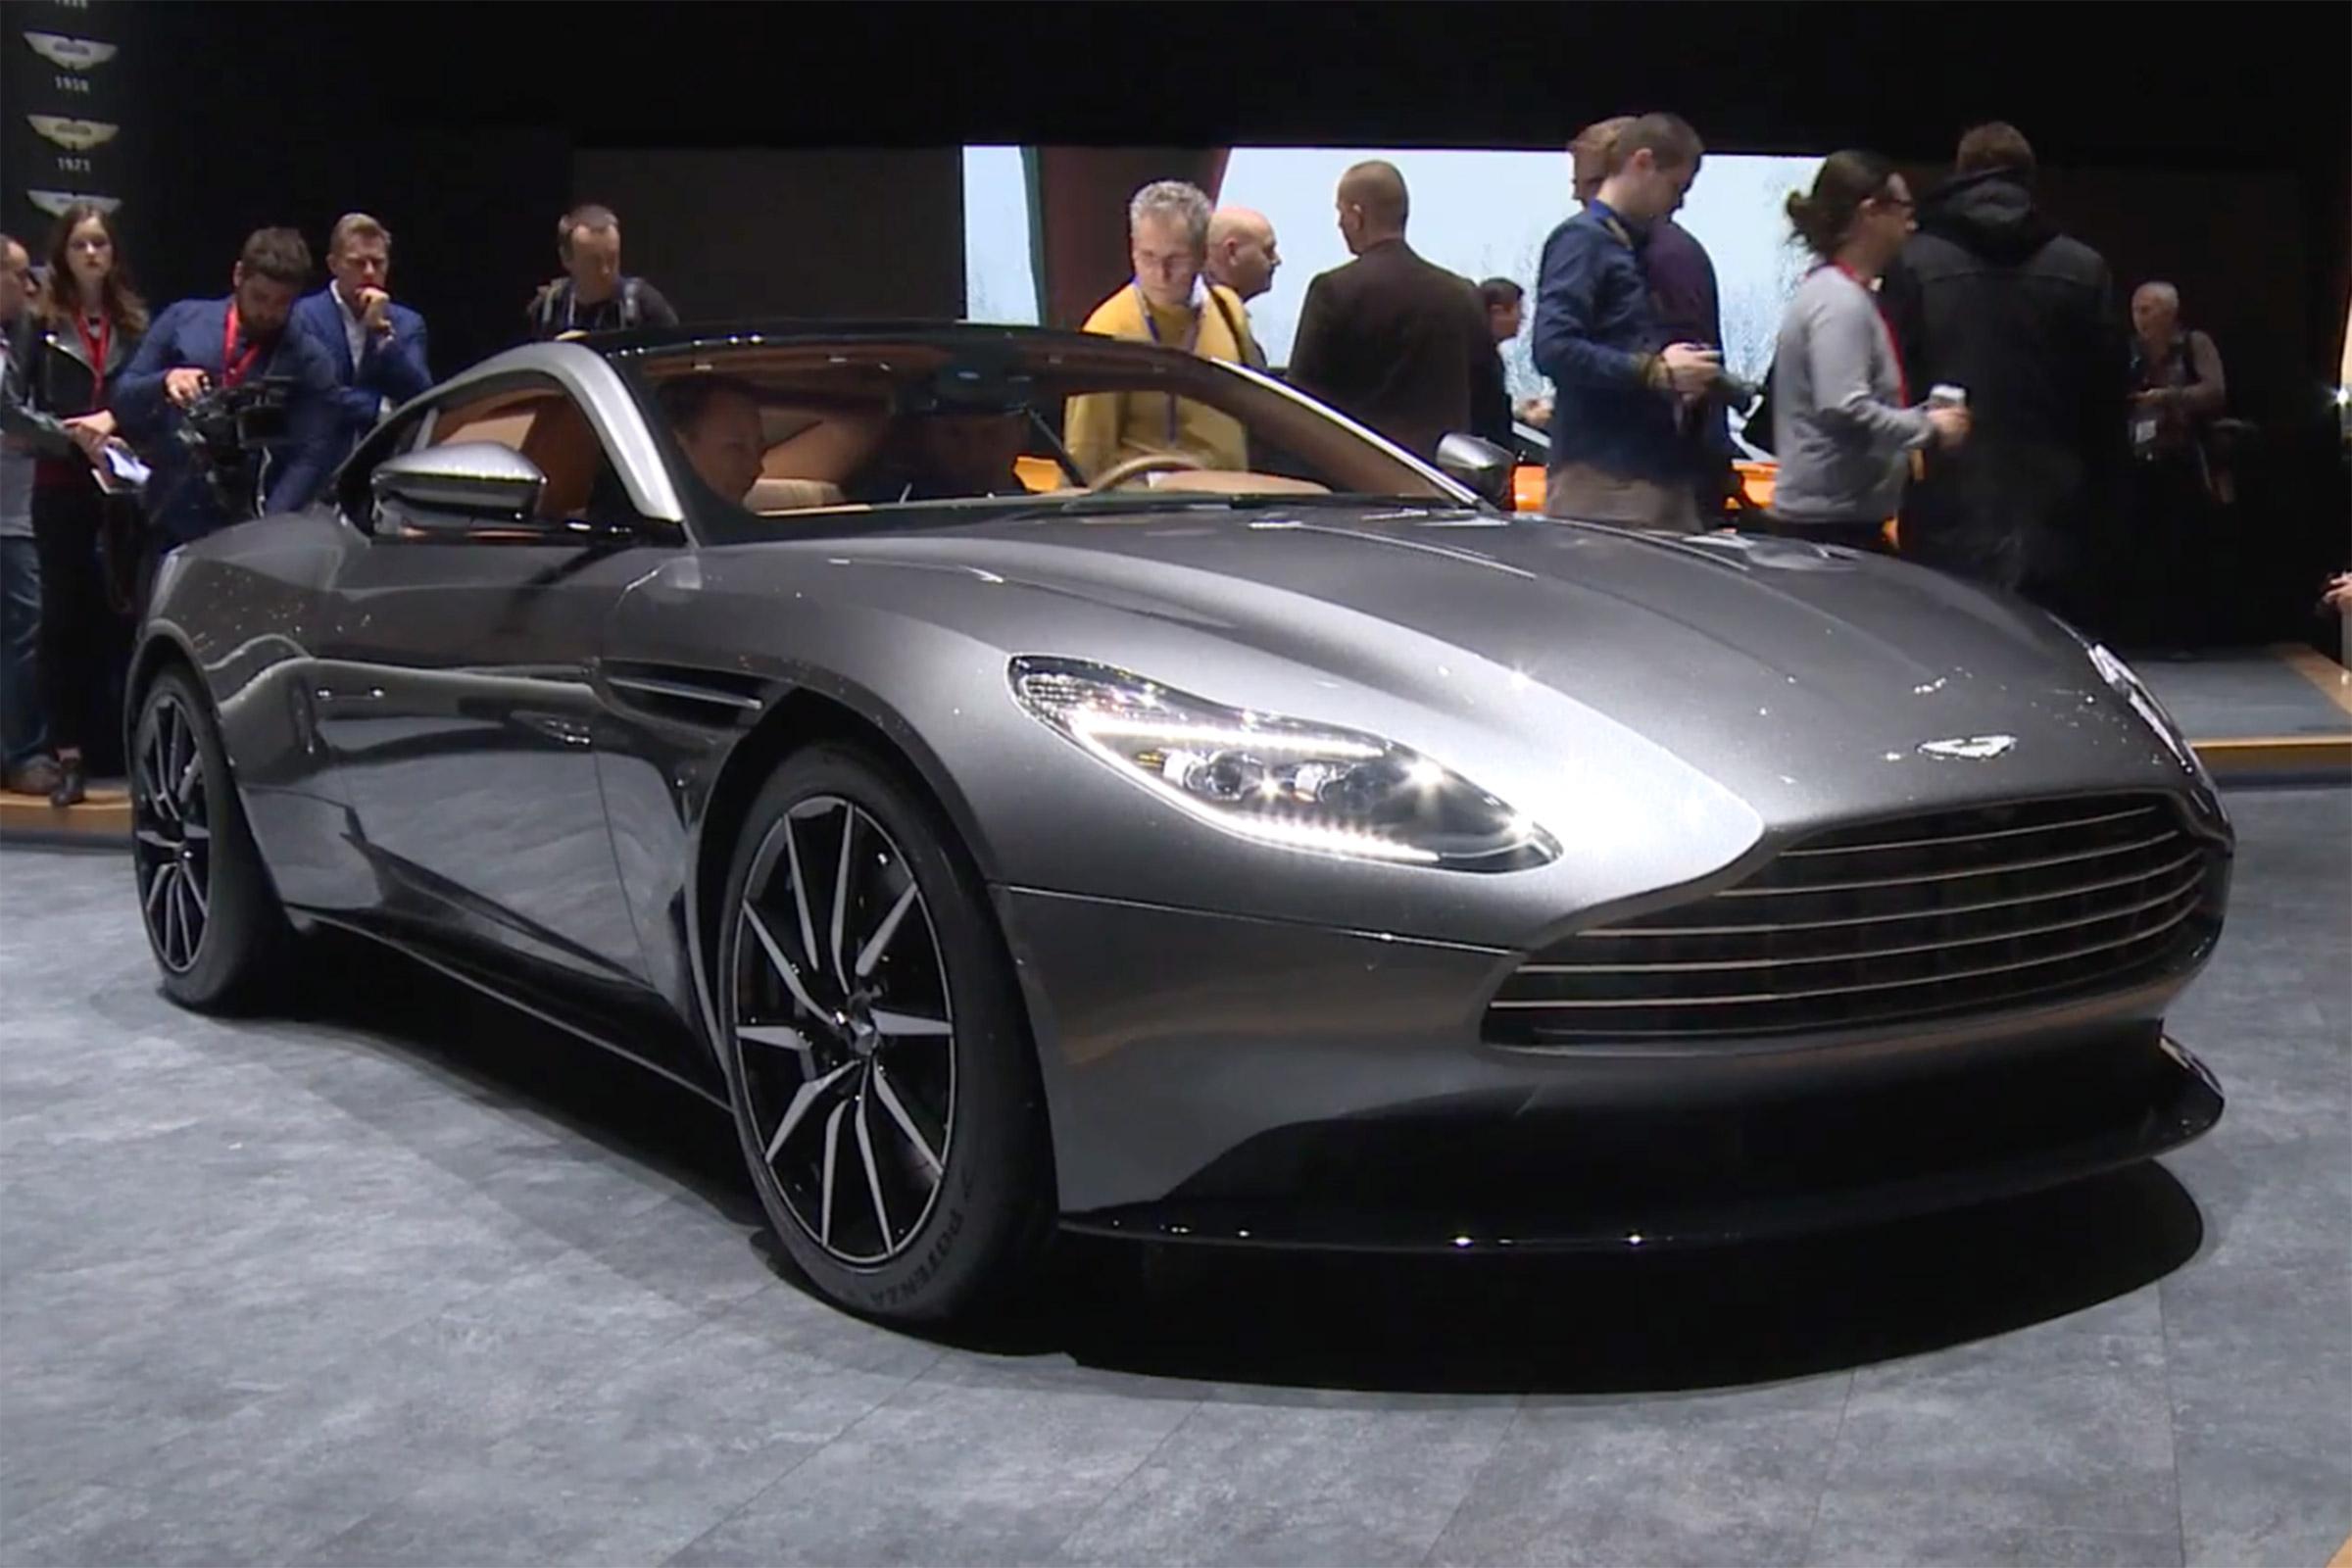 New Aston Martin Db11 Price Specs And Video Auto Express